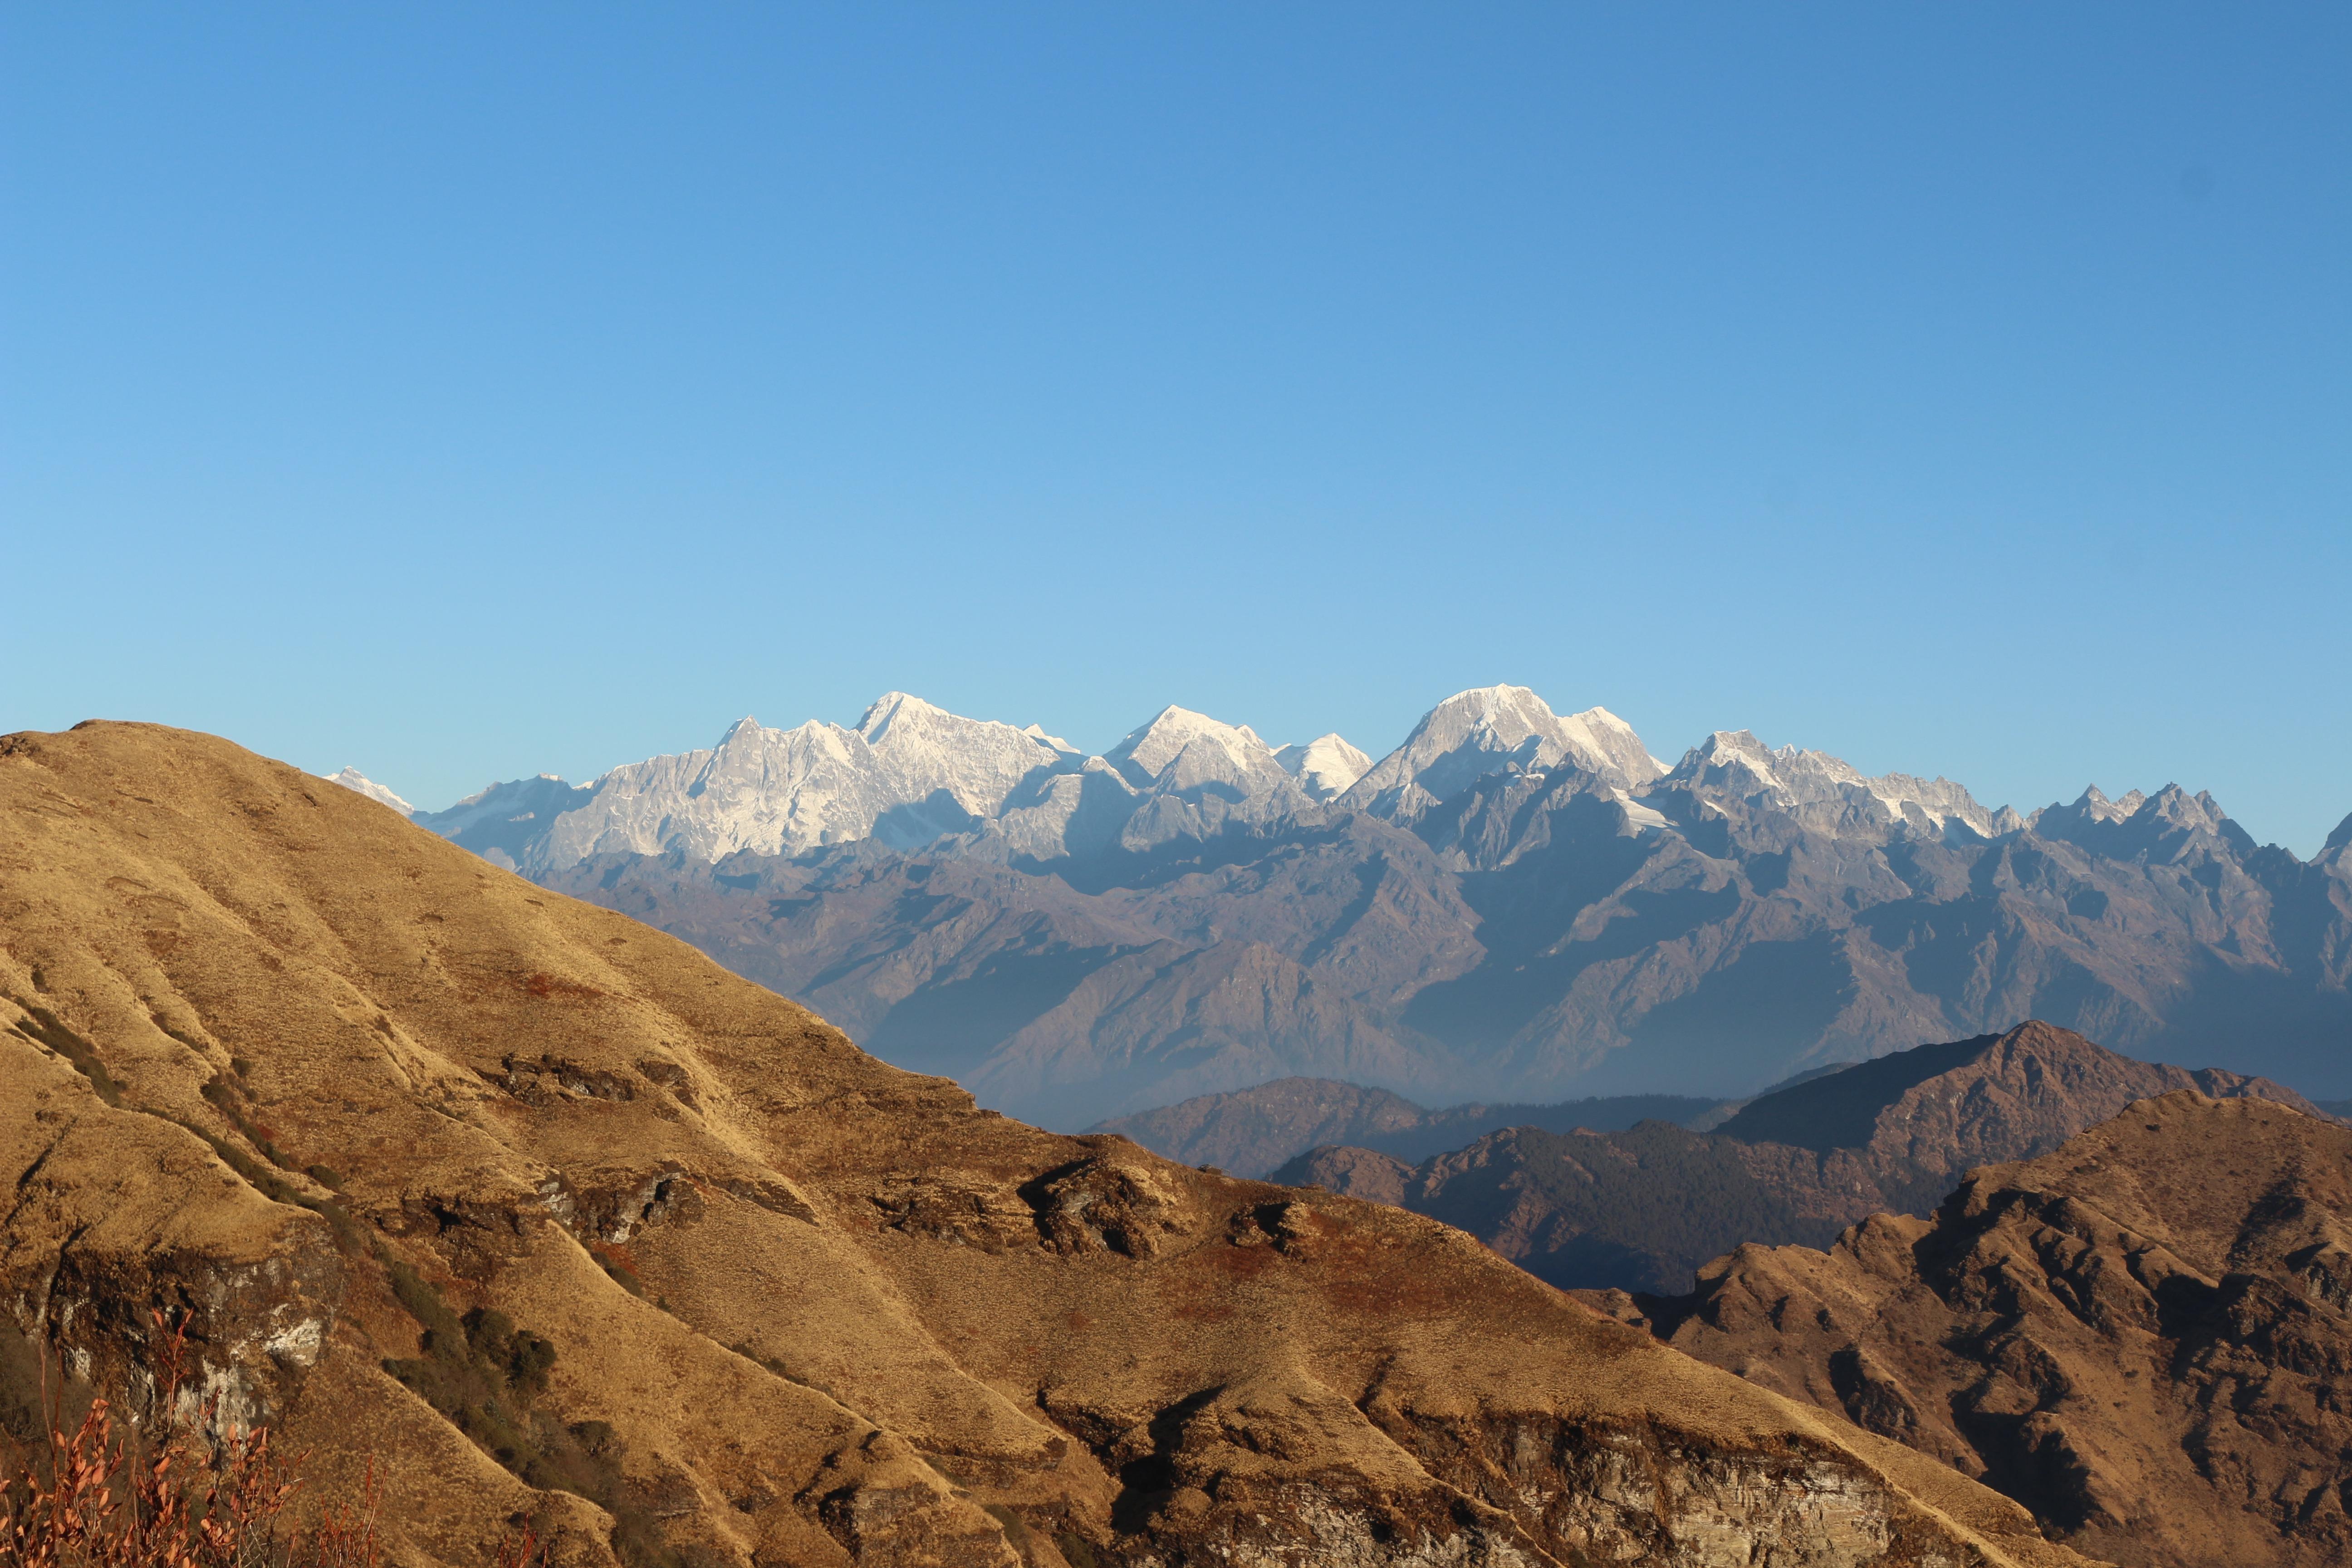 mountain_high_mountains_mountains